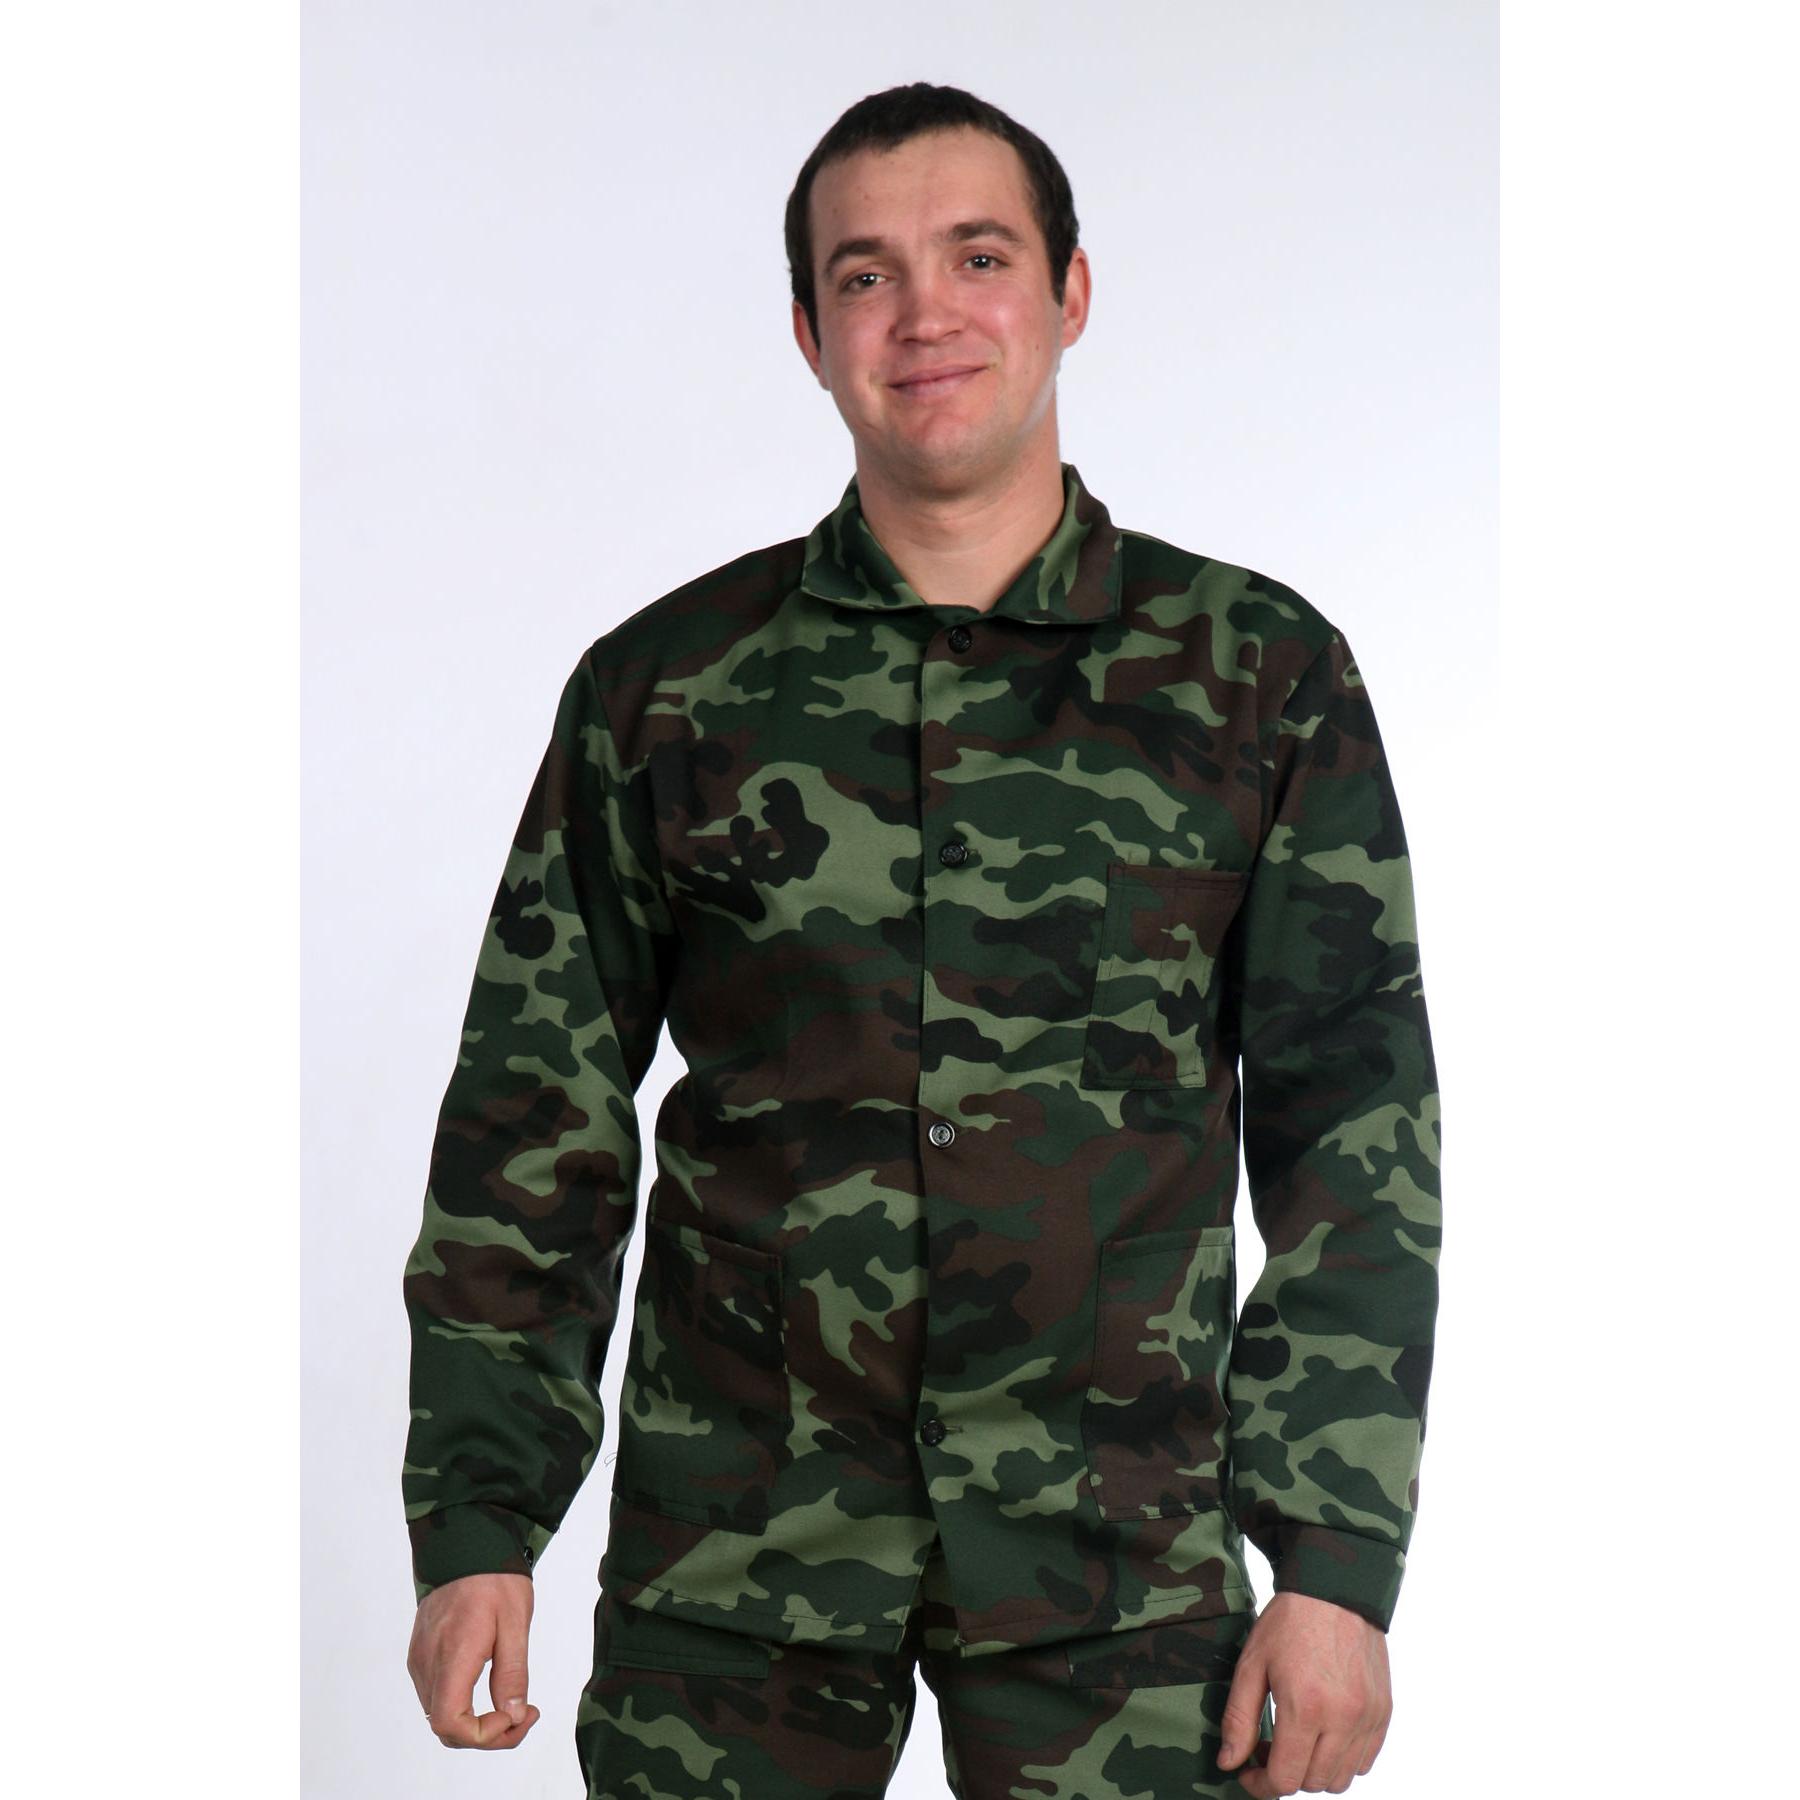 Мужской костюм «Камуфляж», размер 44Спецодежда<br><br><br>Тип: Муж. костюм<br>Размер: 44<br>Материал: Грета